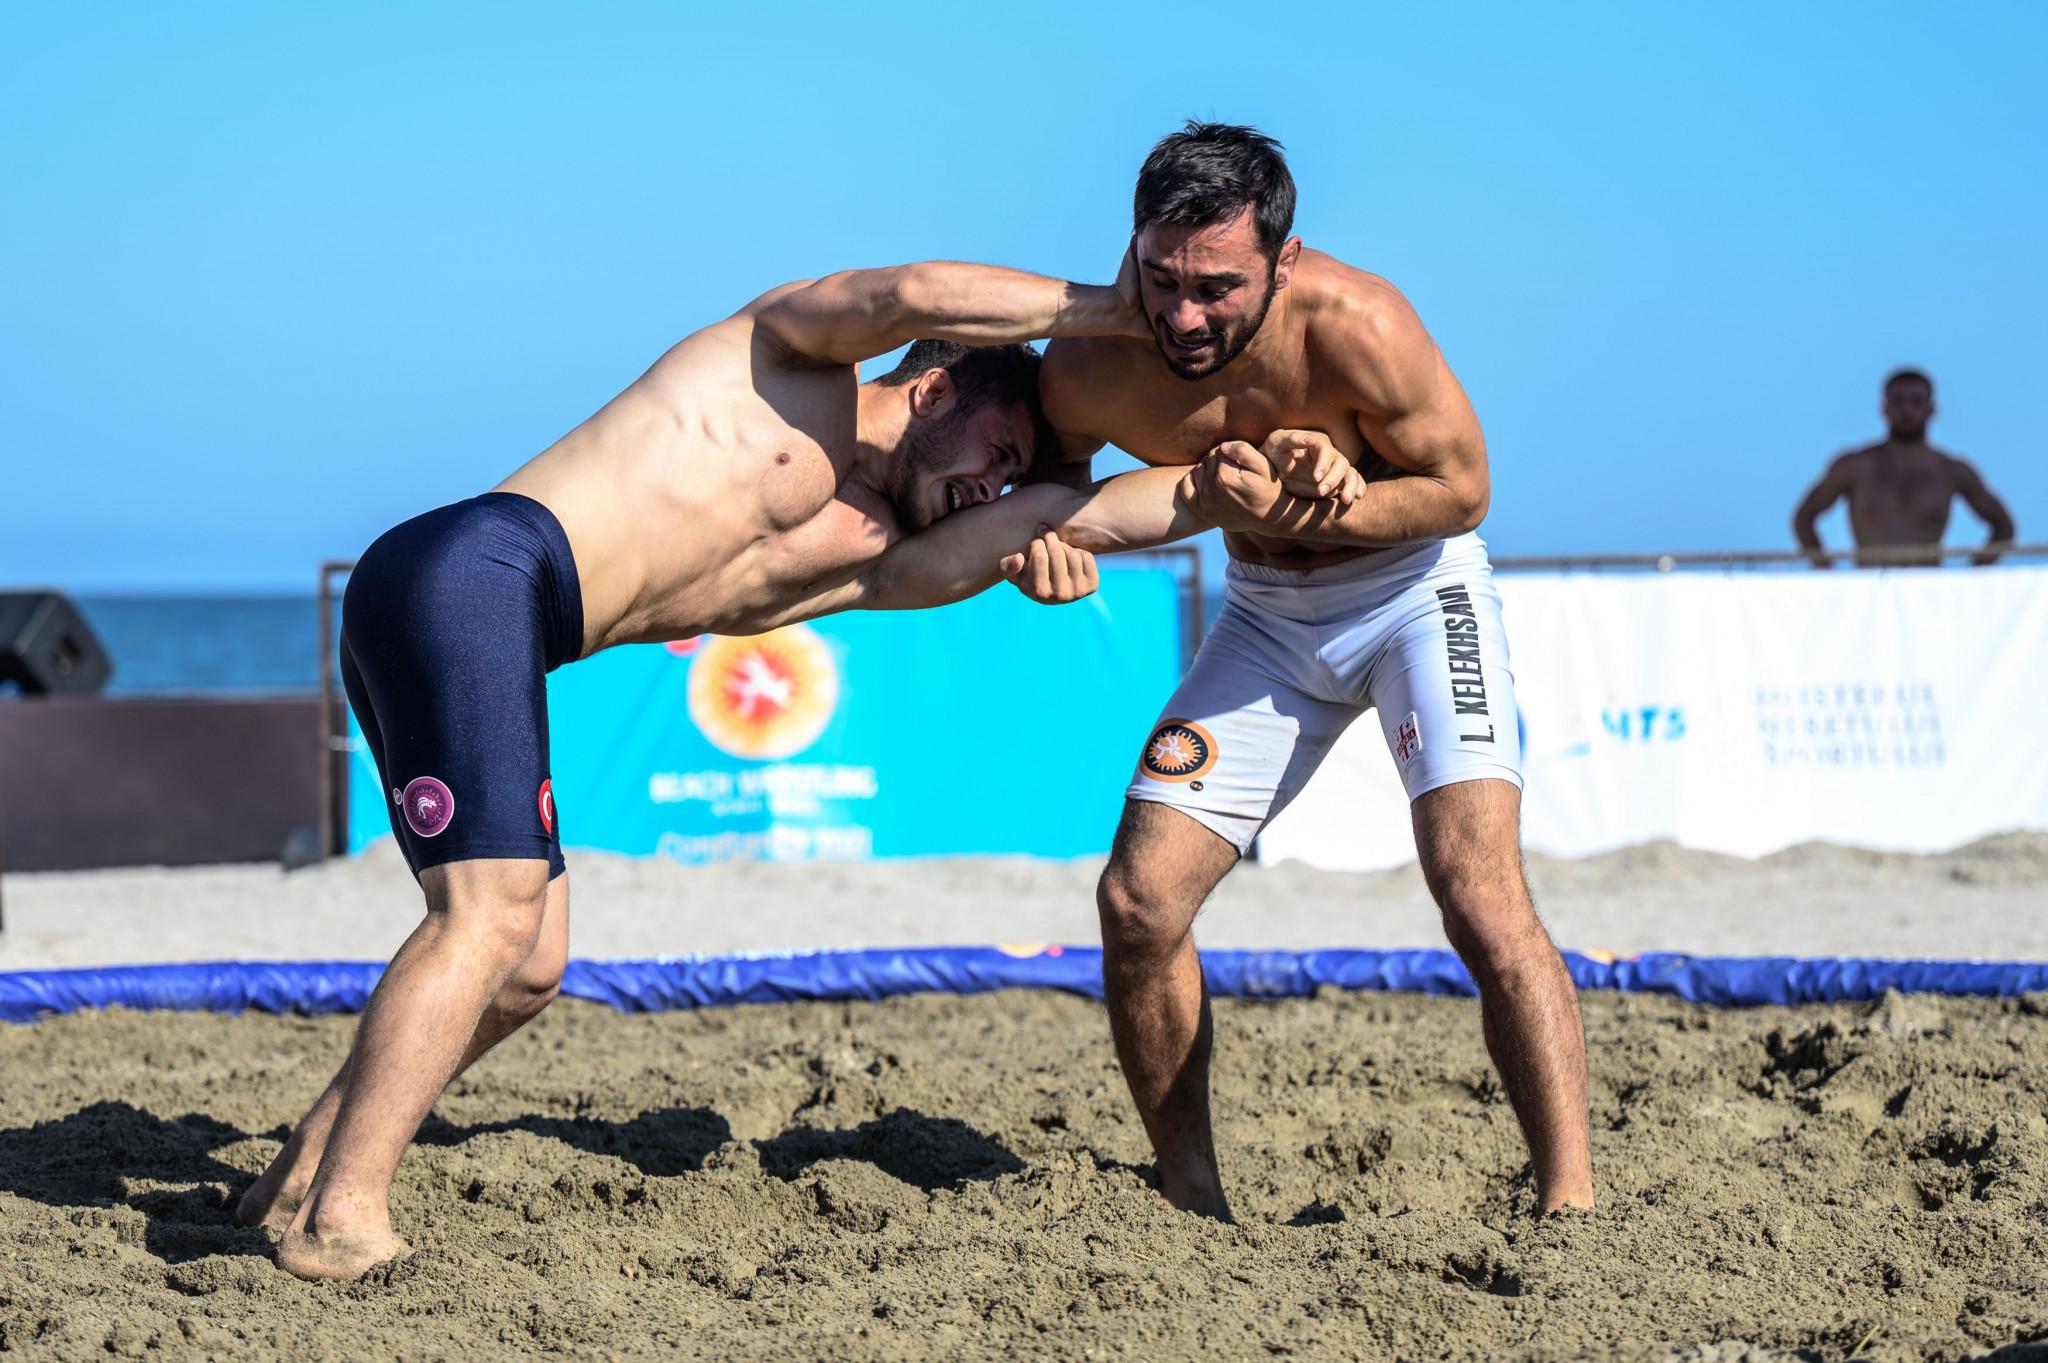 Levan Kelekhsashvili, right, retained his world title in the men's under-70kg division ©United World Wrestling/Beach Wrestling World Series